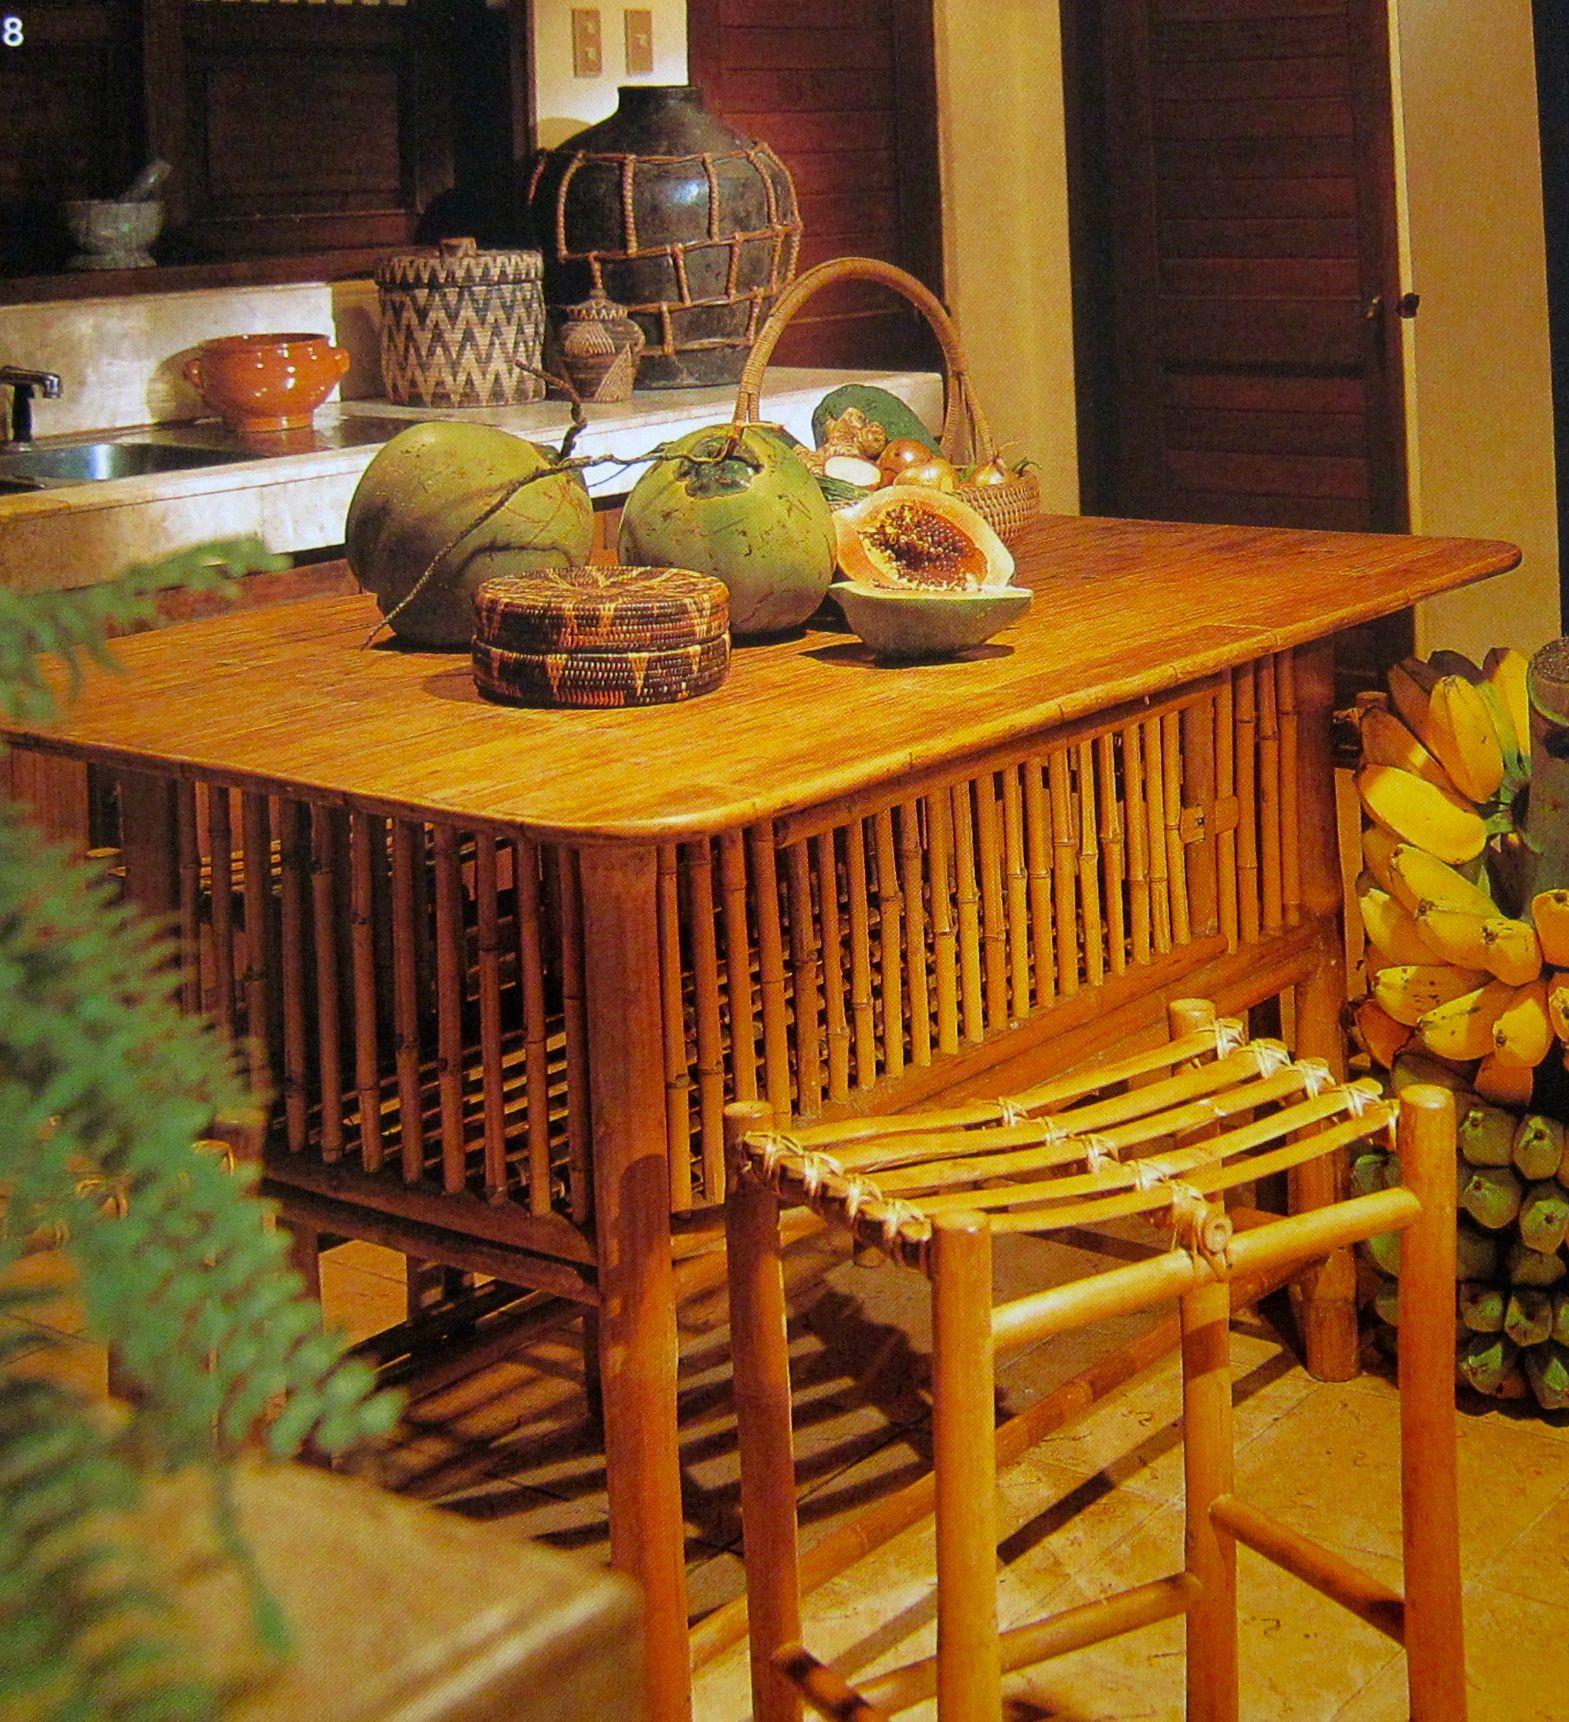 Simple native kitchen design -  Philippines Pilipinas Pinas Dining Table Furniture Native Southeastasia